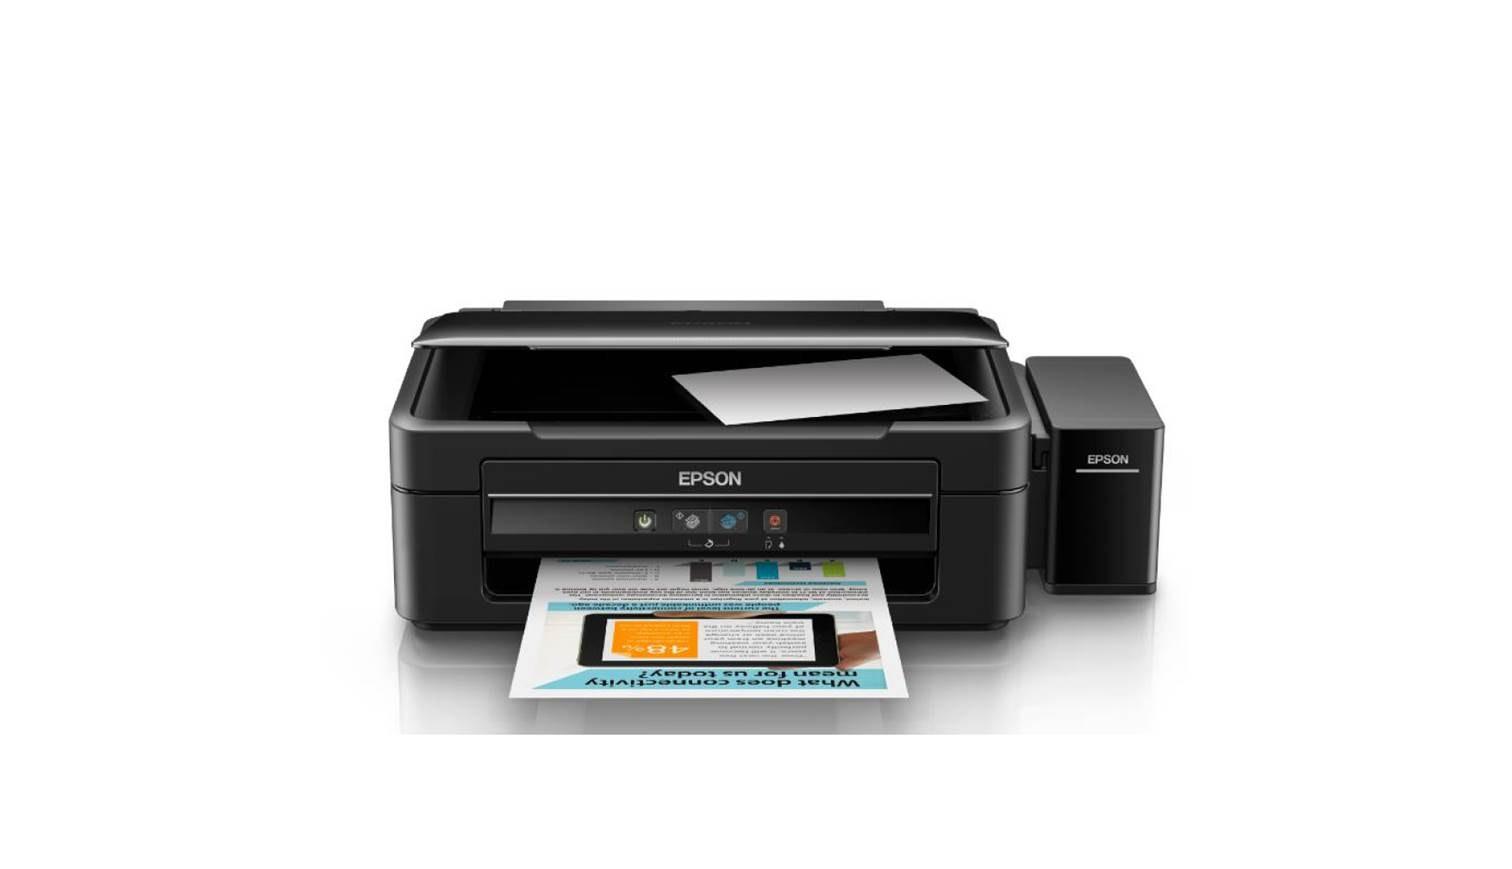 Epson L360 All In One Inkjet Printer Harvey Norman Singapore : 0014141epson l360 all in one inkjet psc from www.harveynorman.com.sg size 1512 x 869 jpeg 32kB